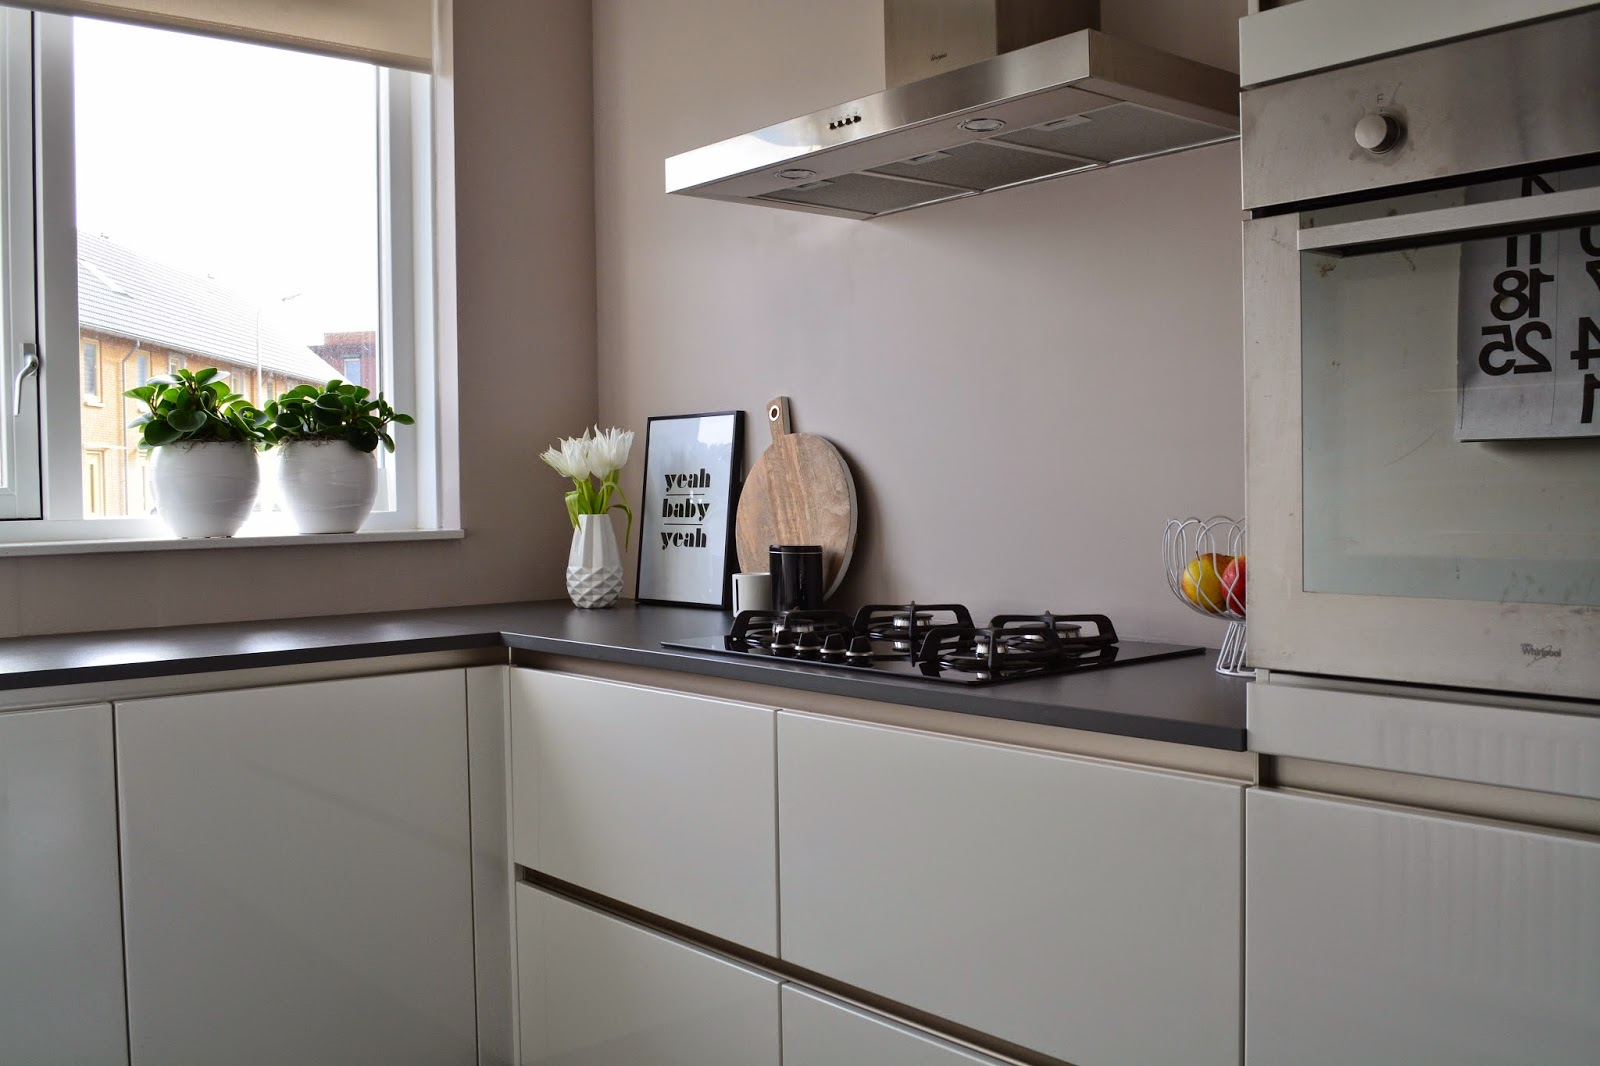 Keuken Kleur Taupe : Keuken Taupe Hoogglans: Keuken wit met grijs blad : vri interieur